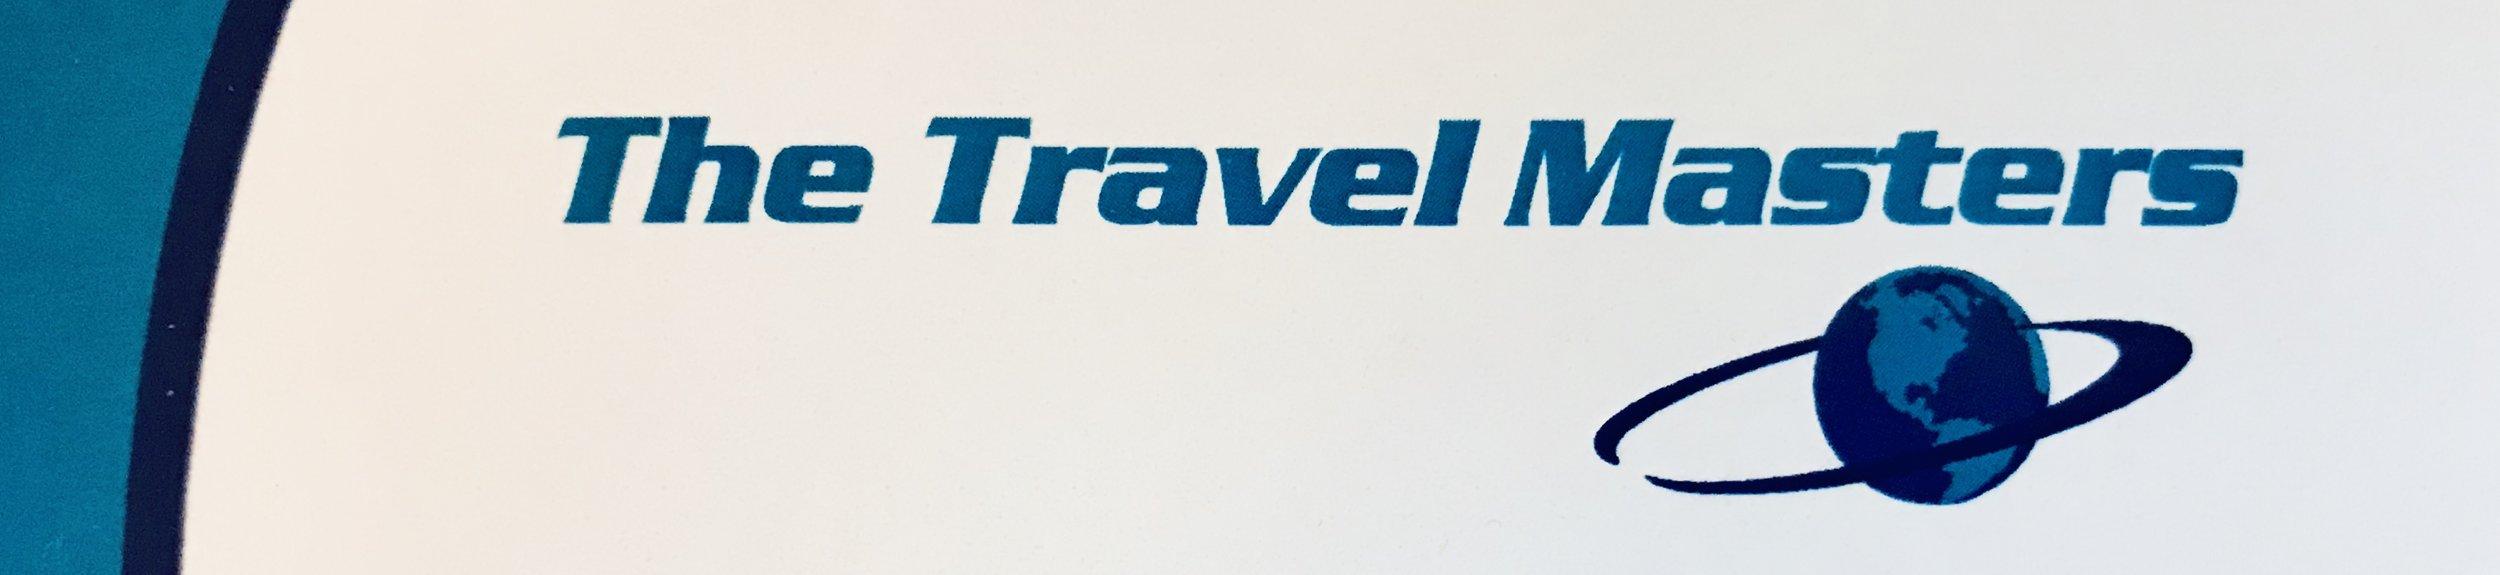 TravelMasters.jpg